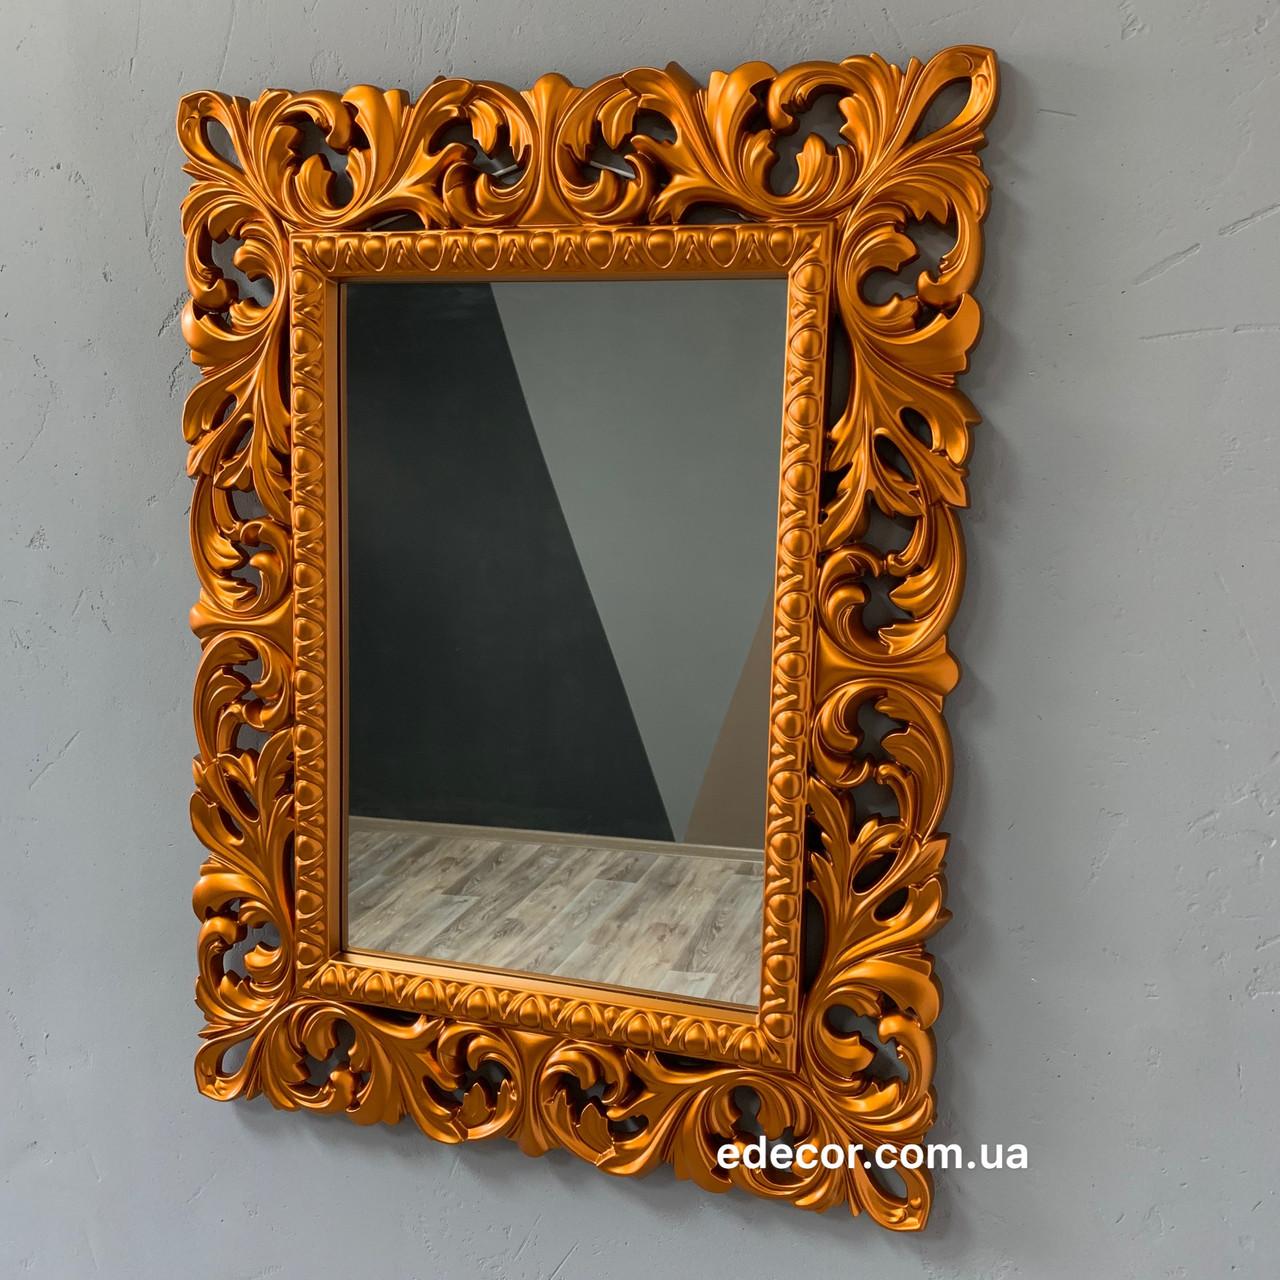 Зеркало в бронзовой раме(2) Dodoma